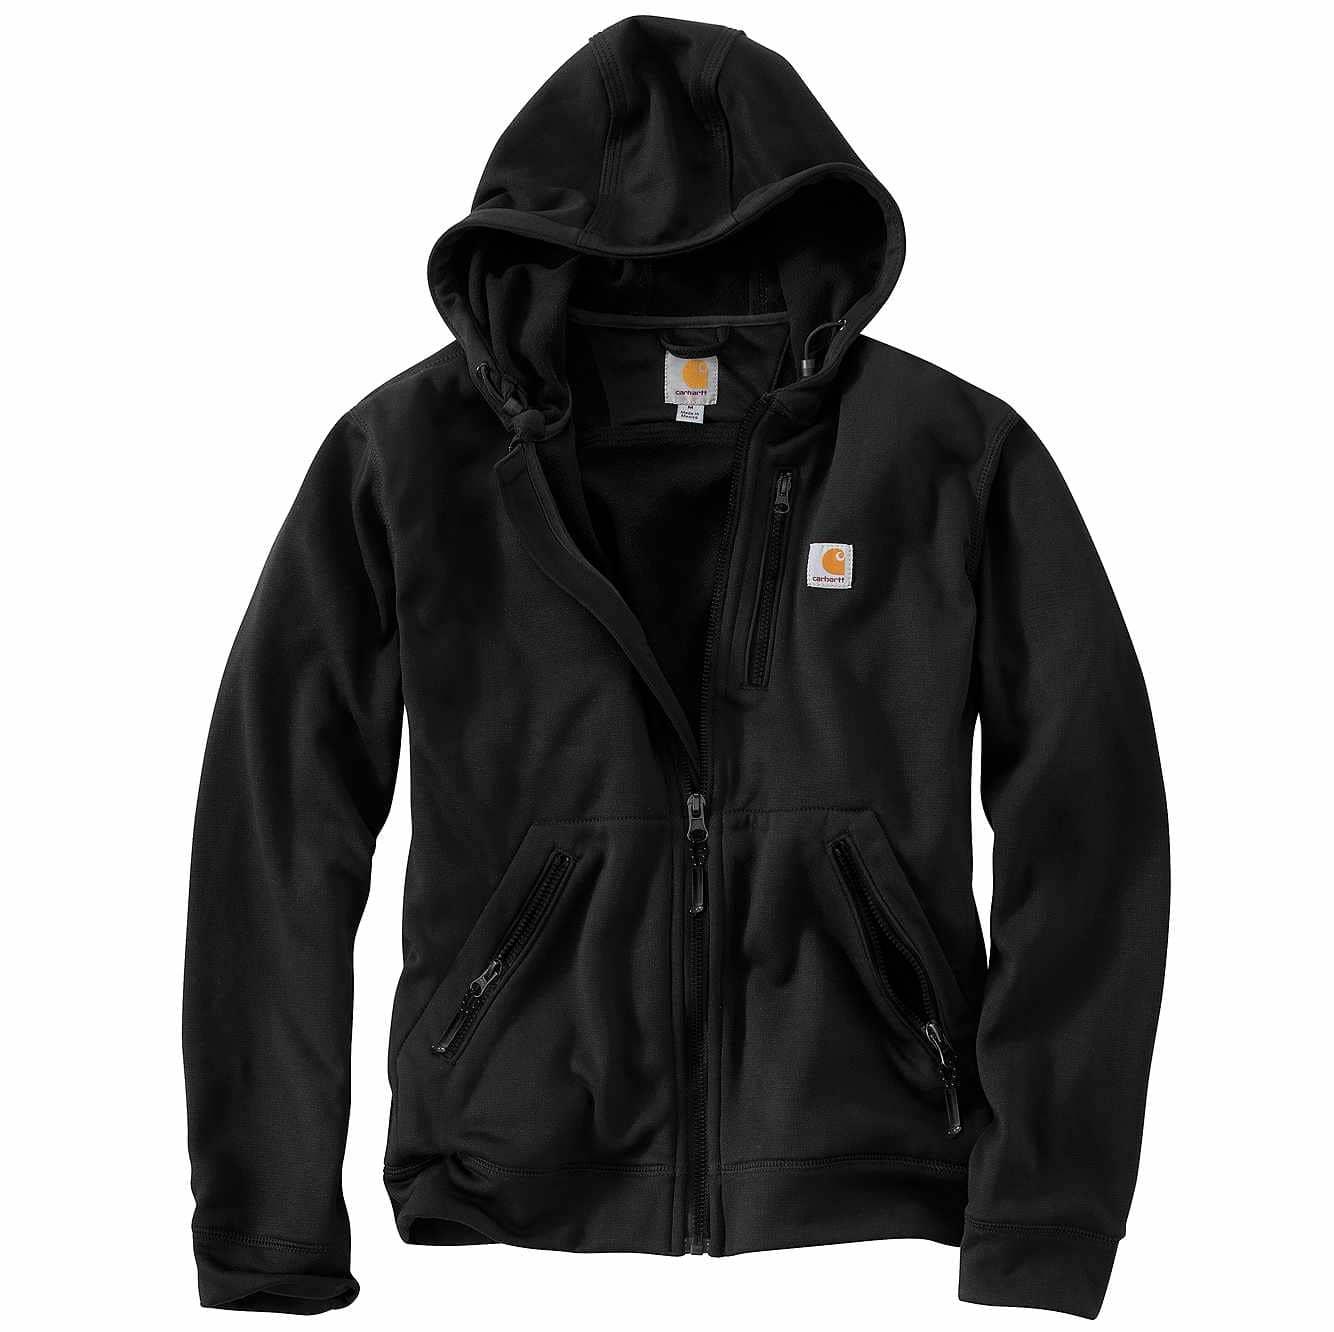 Picture of Fraser Hooded Jacket in Black